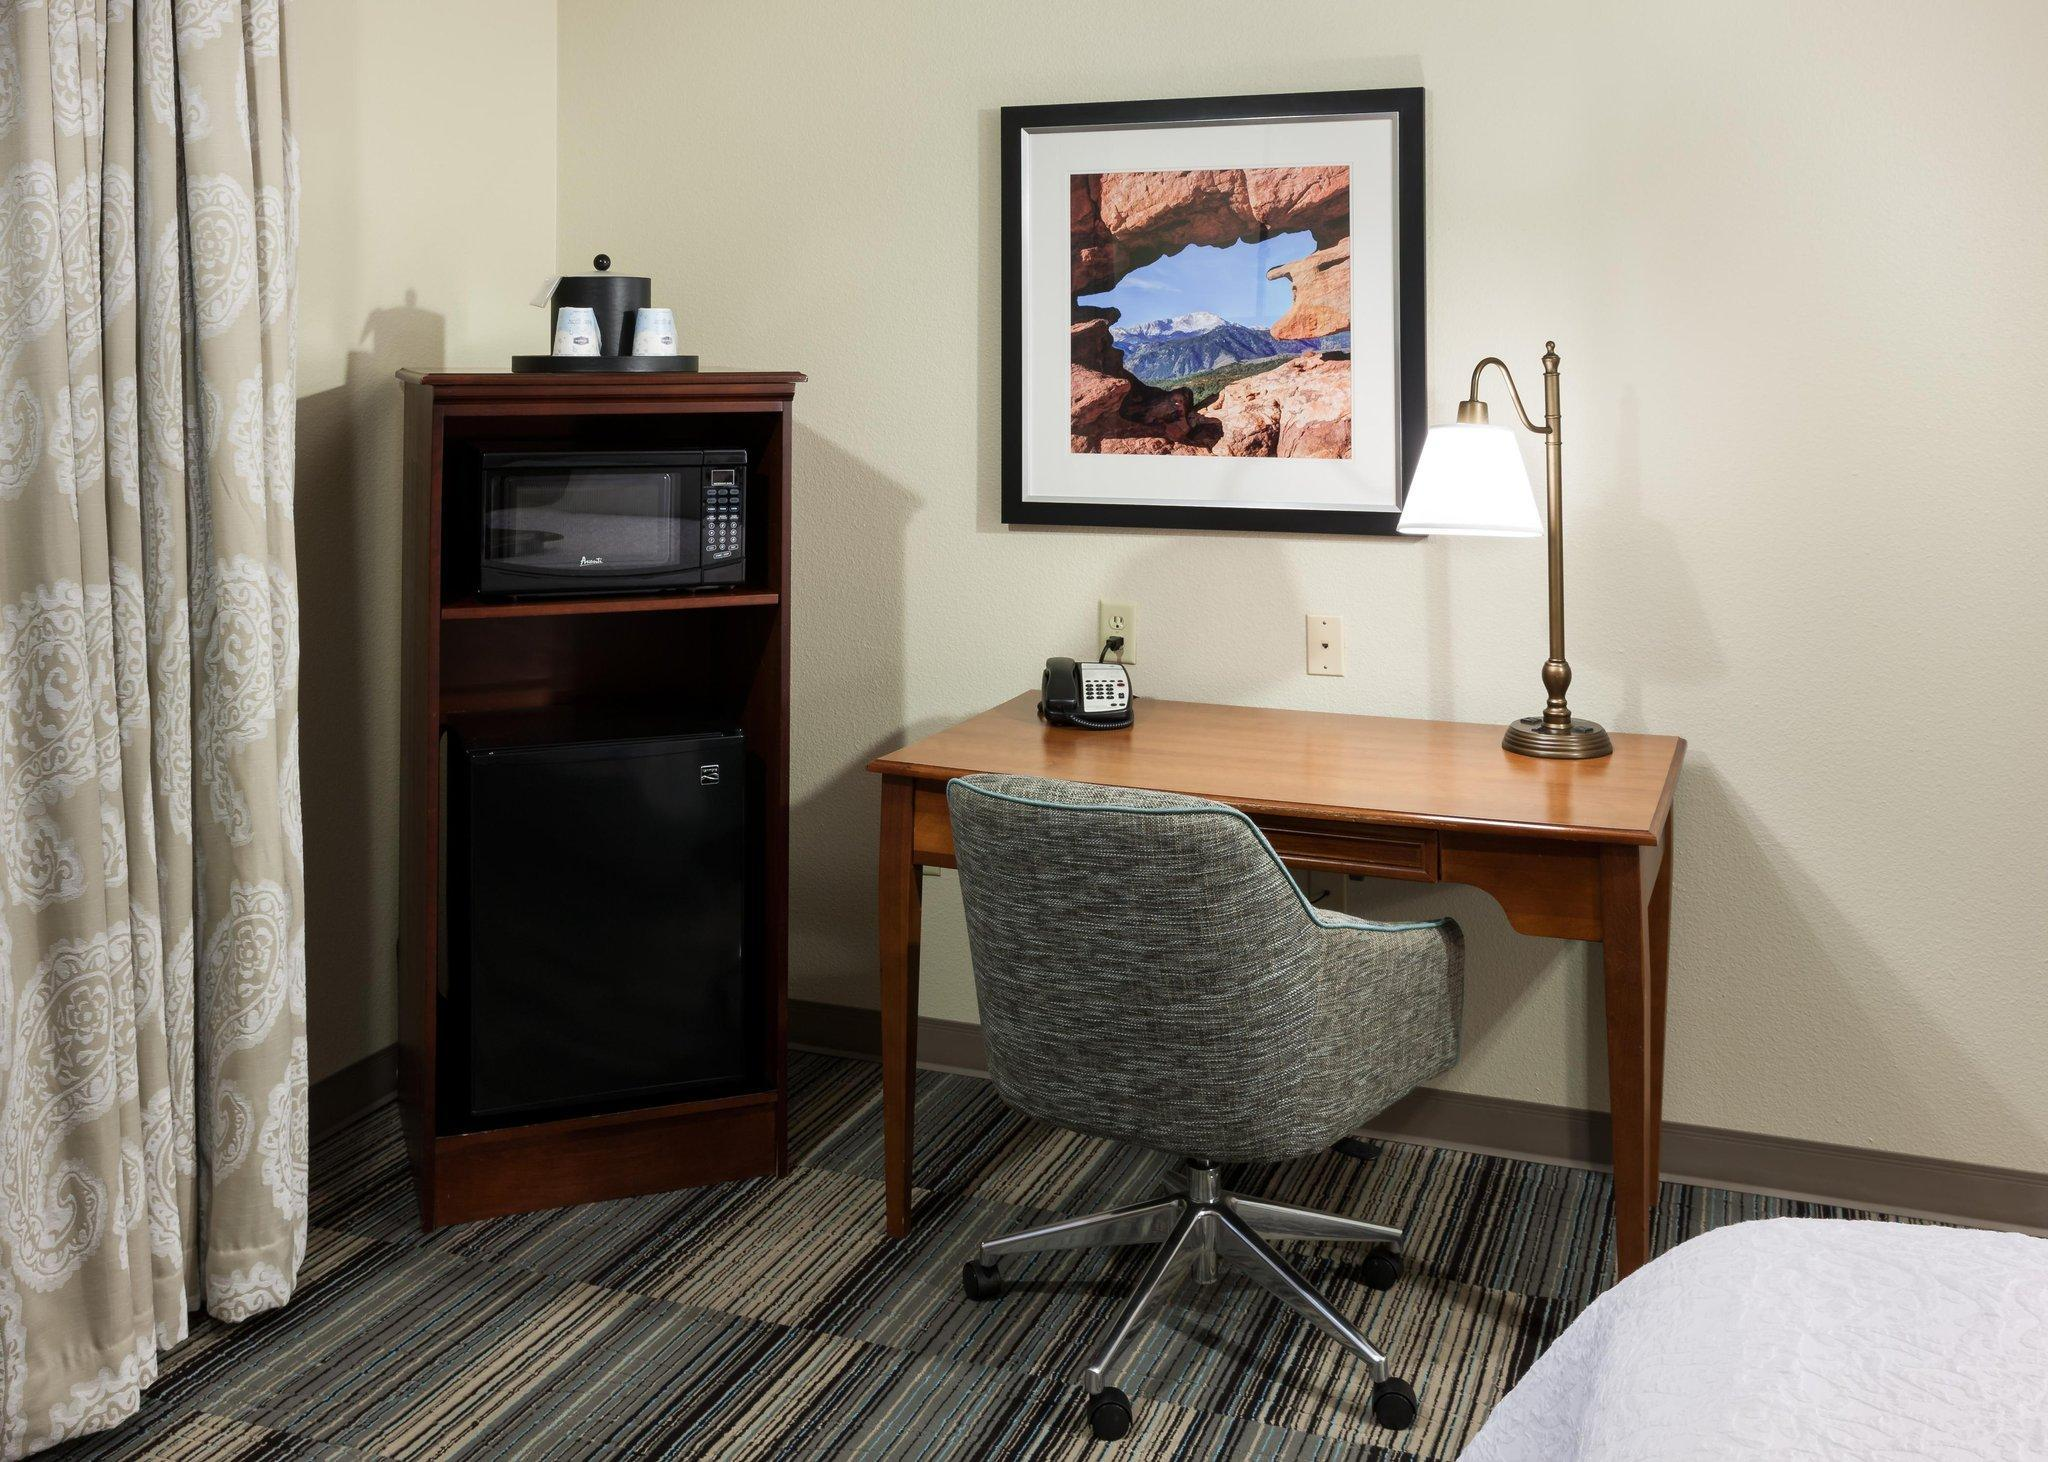 Hampton Inn & Suites Colorado Springs I 25 South